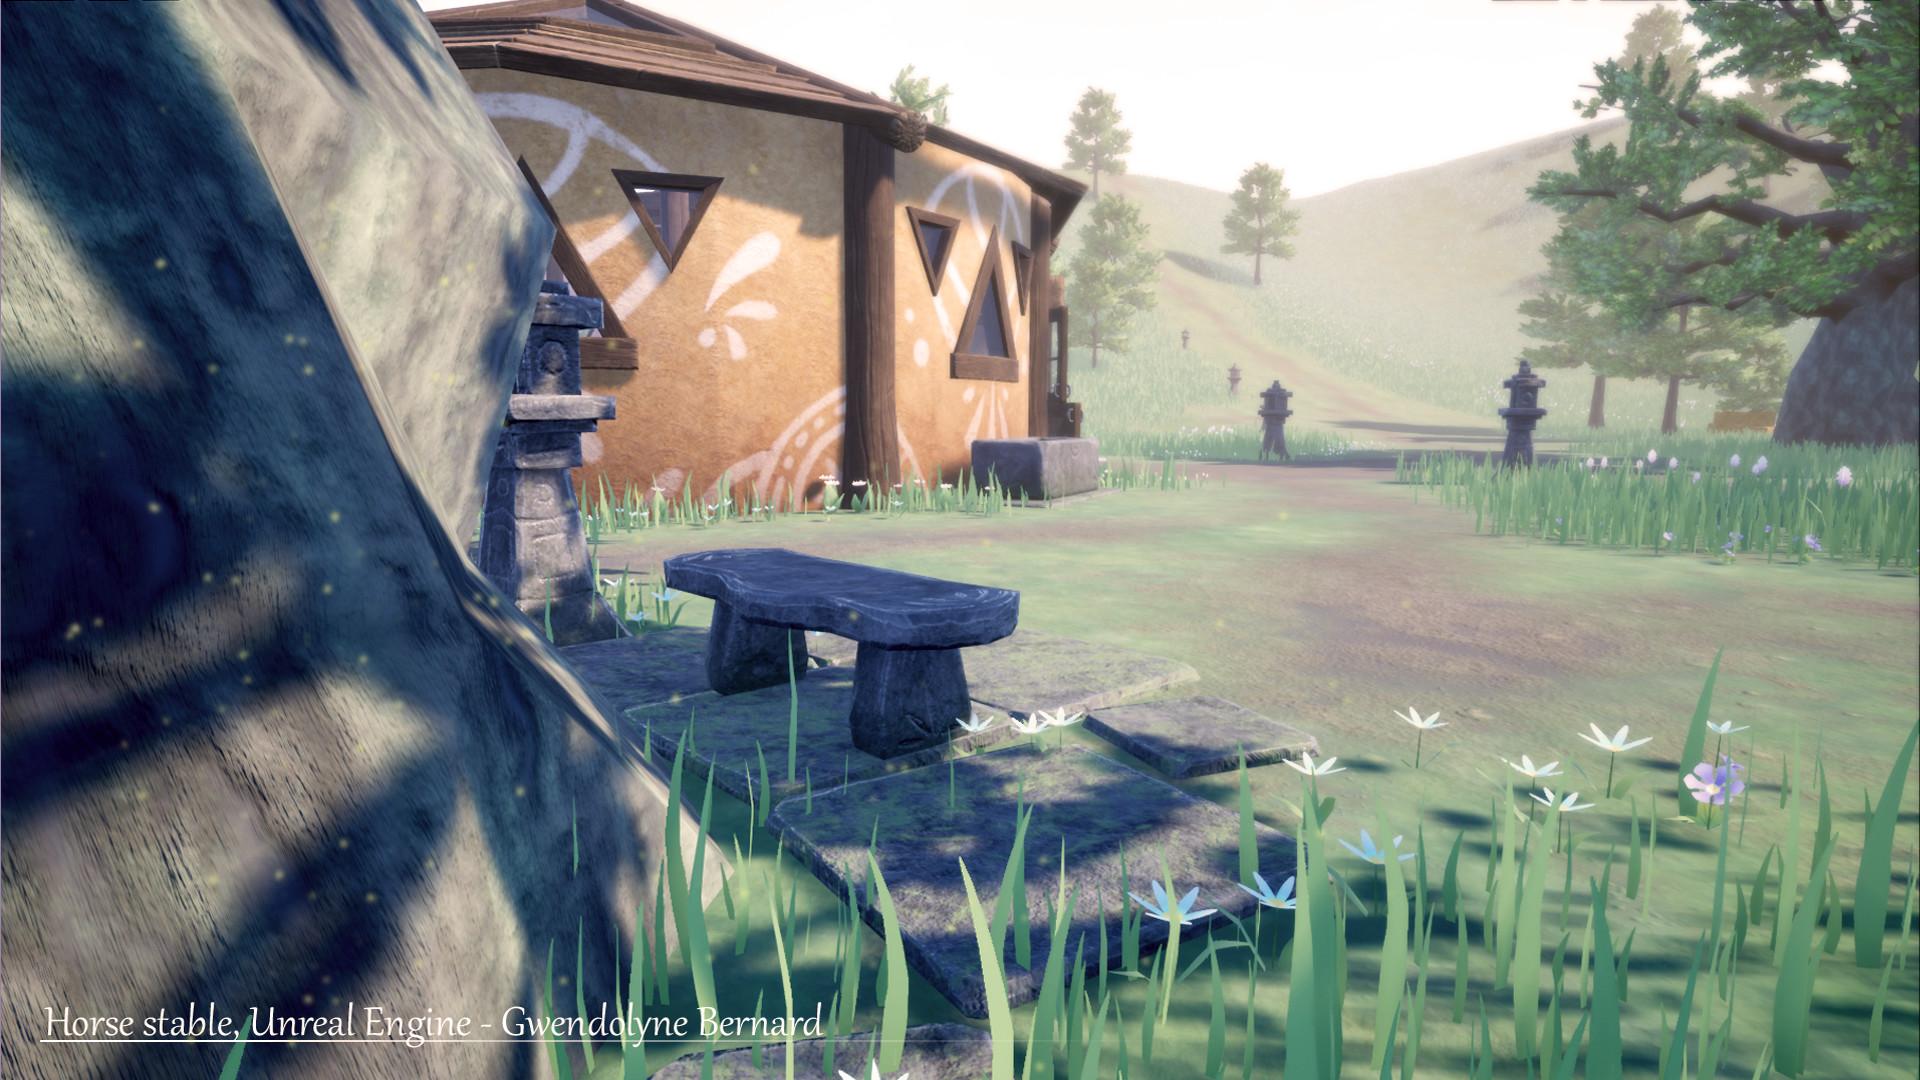 ArtStation - Horse stable (Zelda Breath of the Wild style